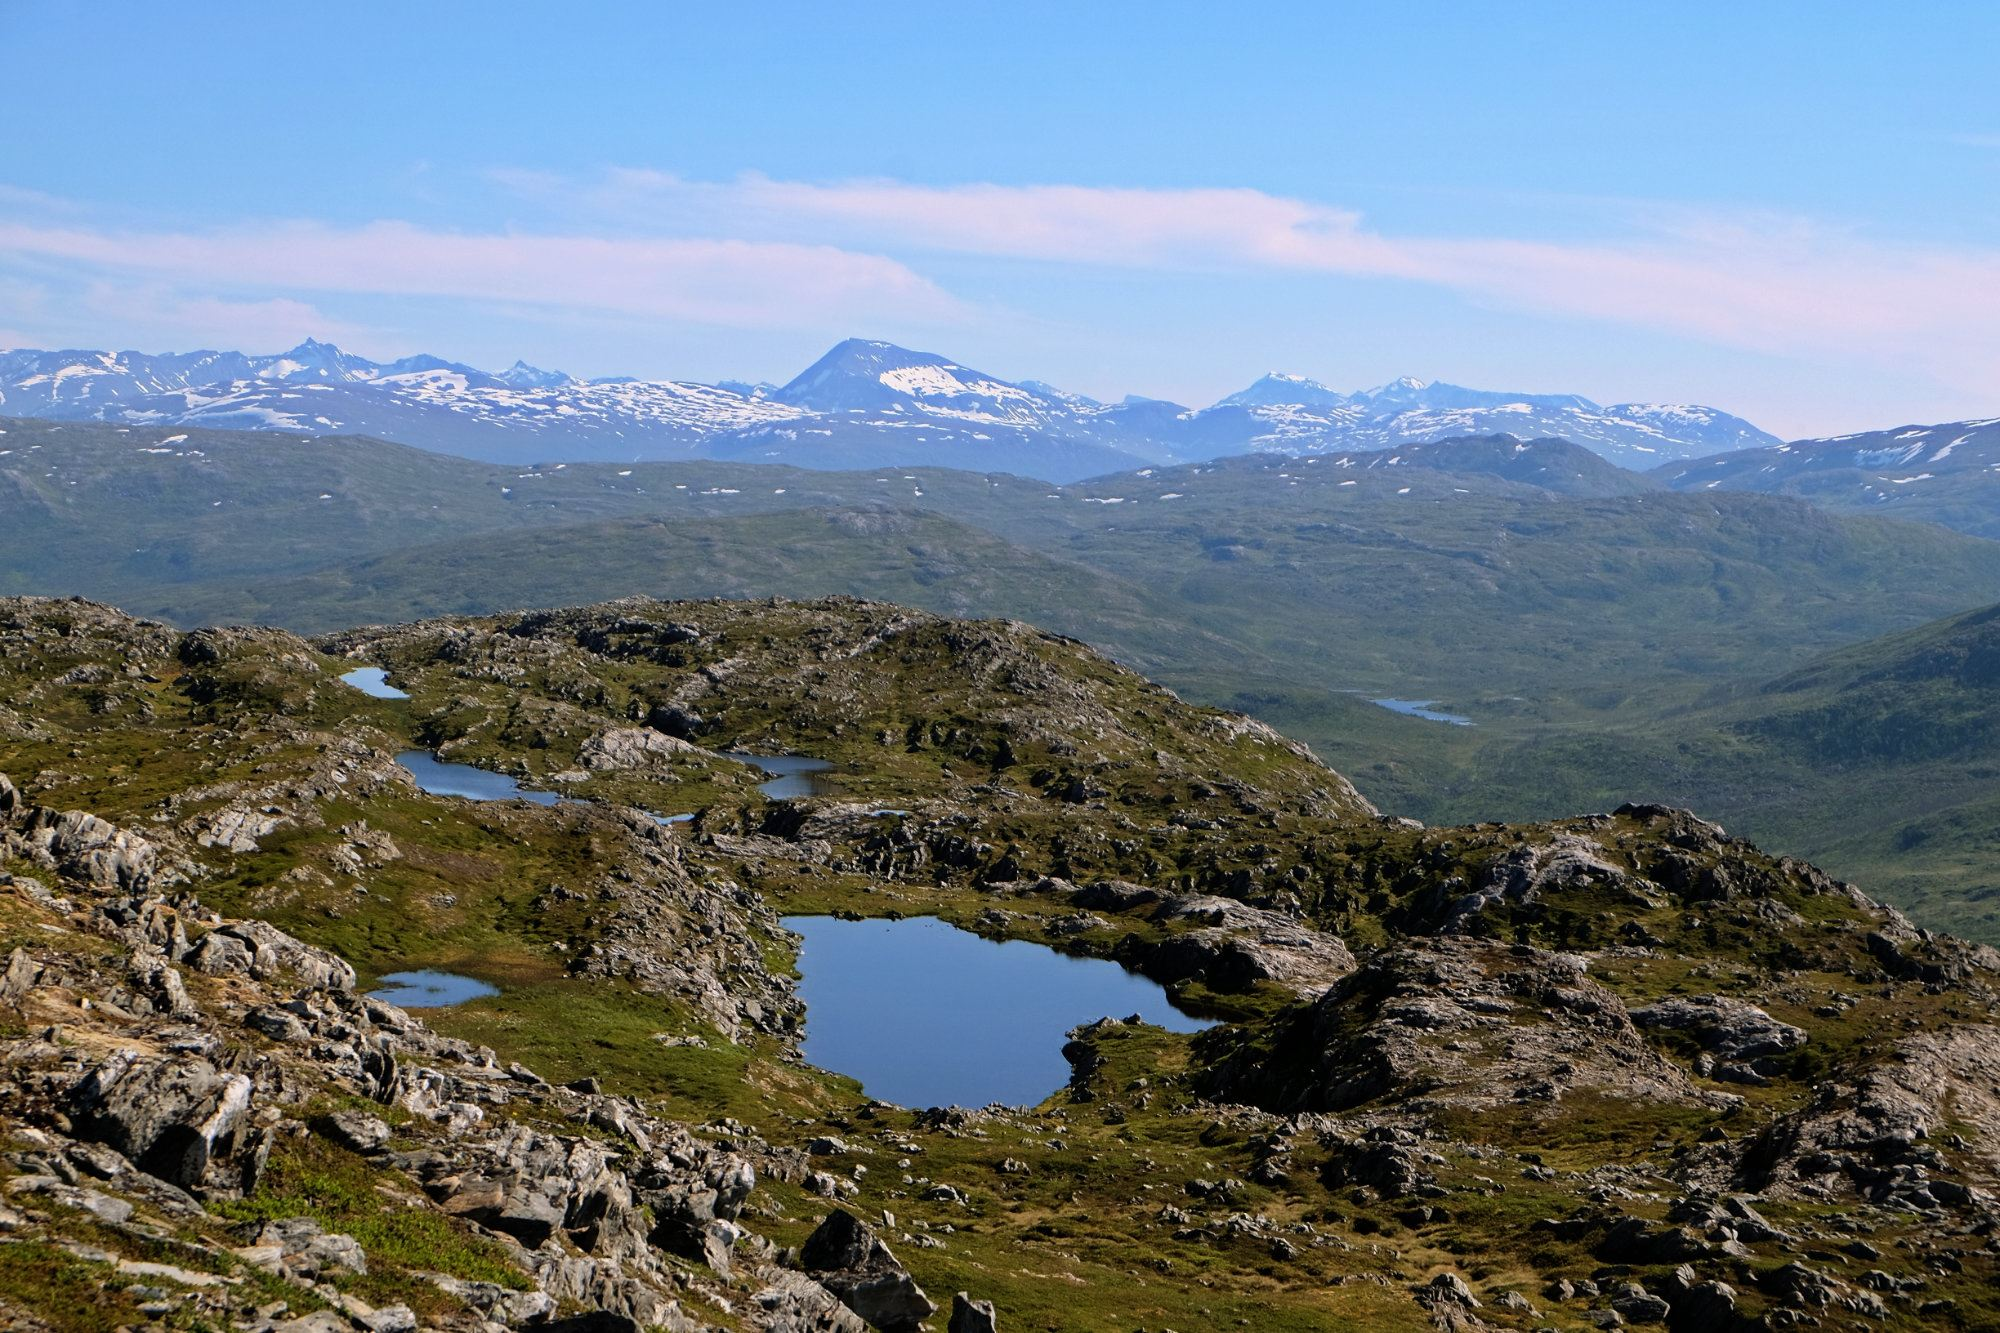 Flott fottur – Fantastisk utsikt! - The Green Adventure